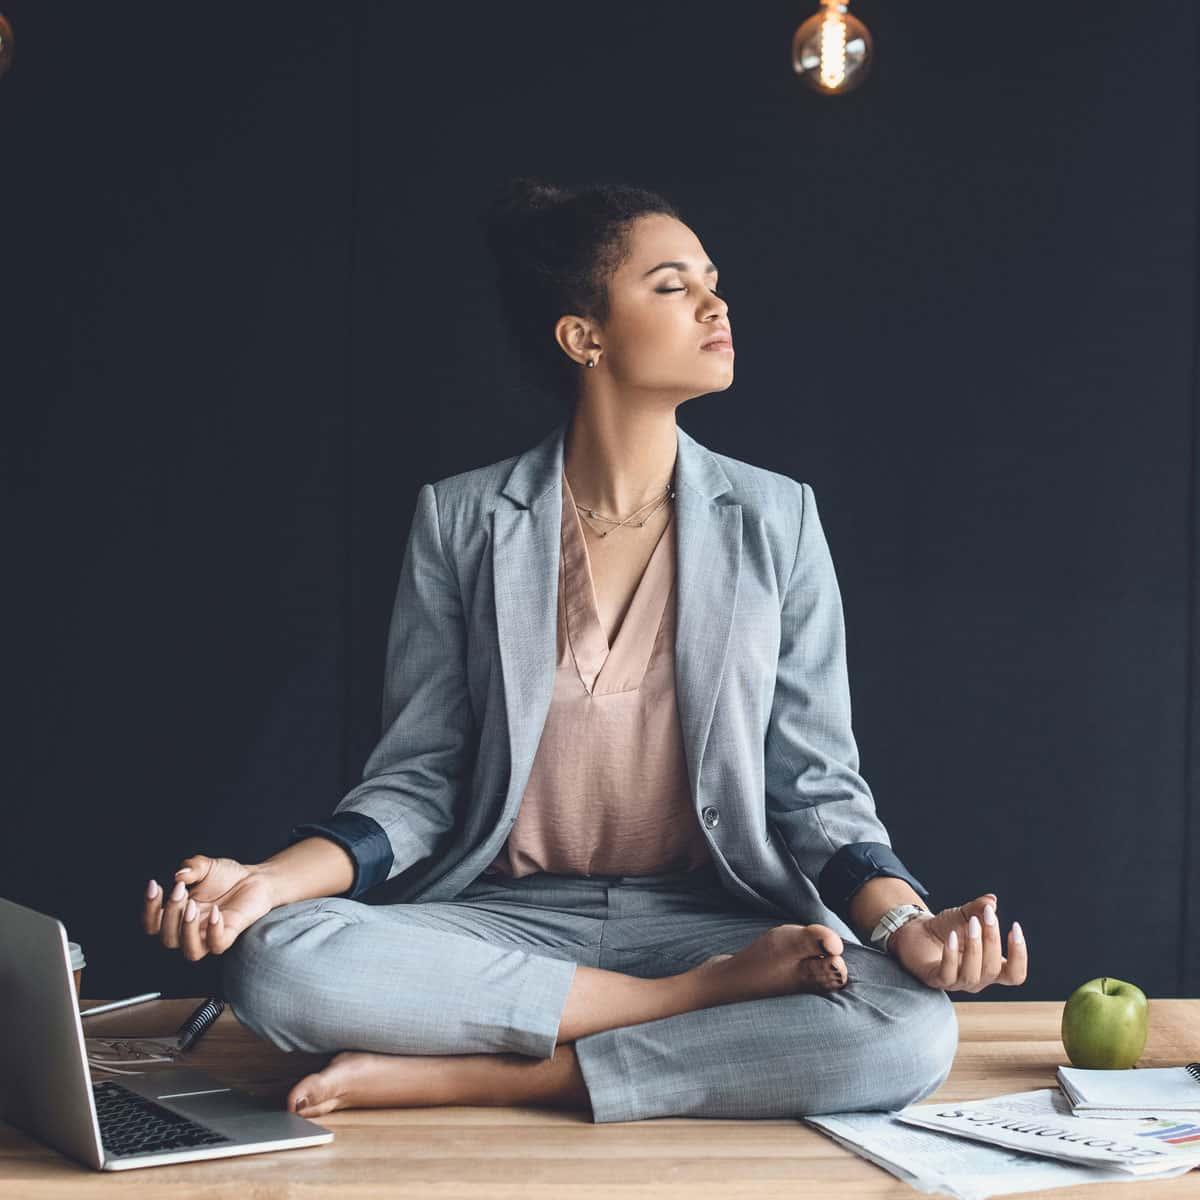 Woman exercising her mind through meditation